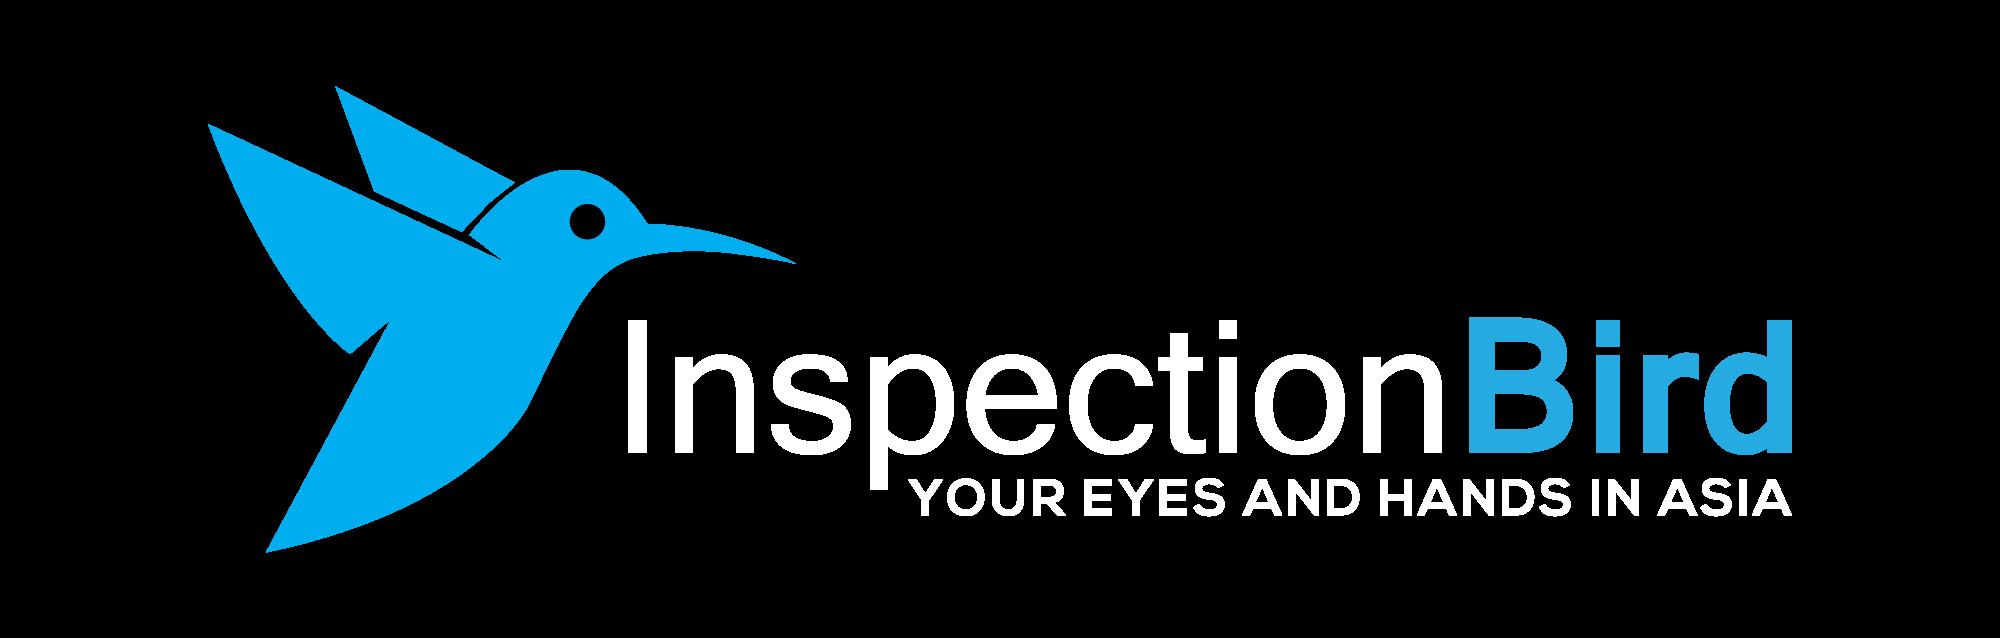 Inspection Bird Logo White